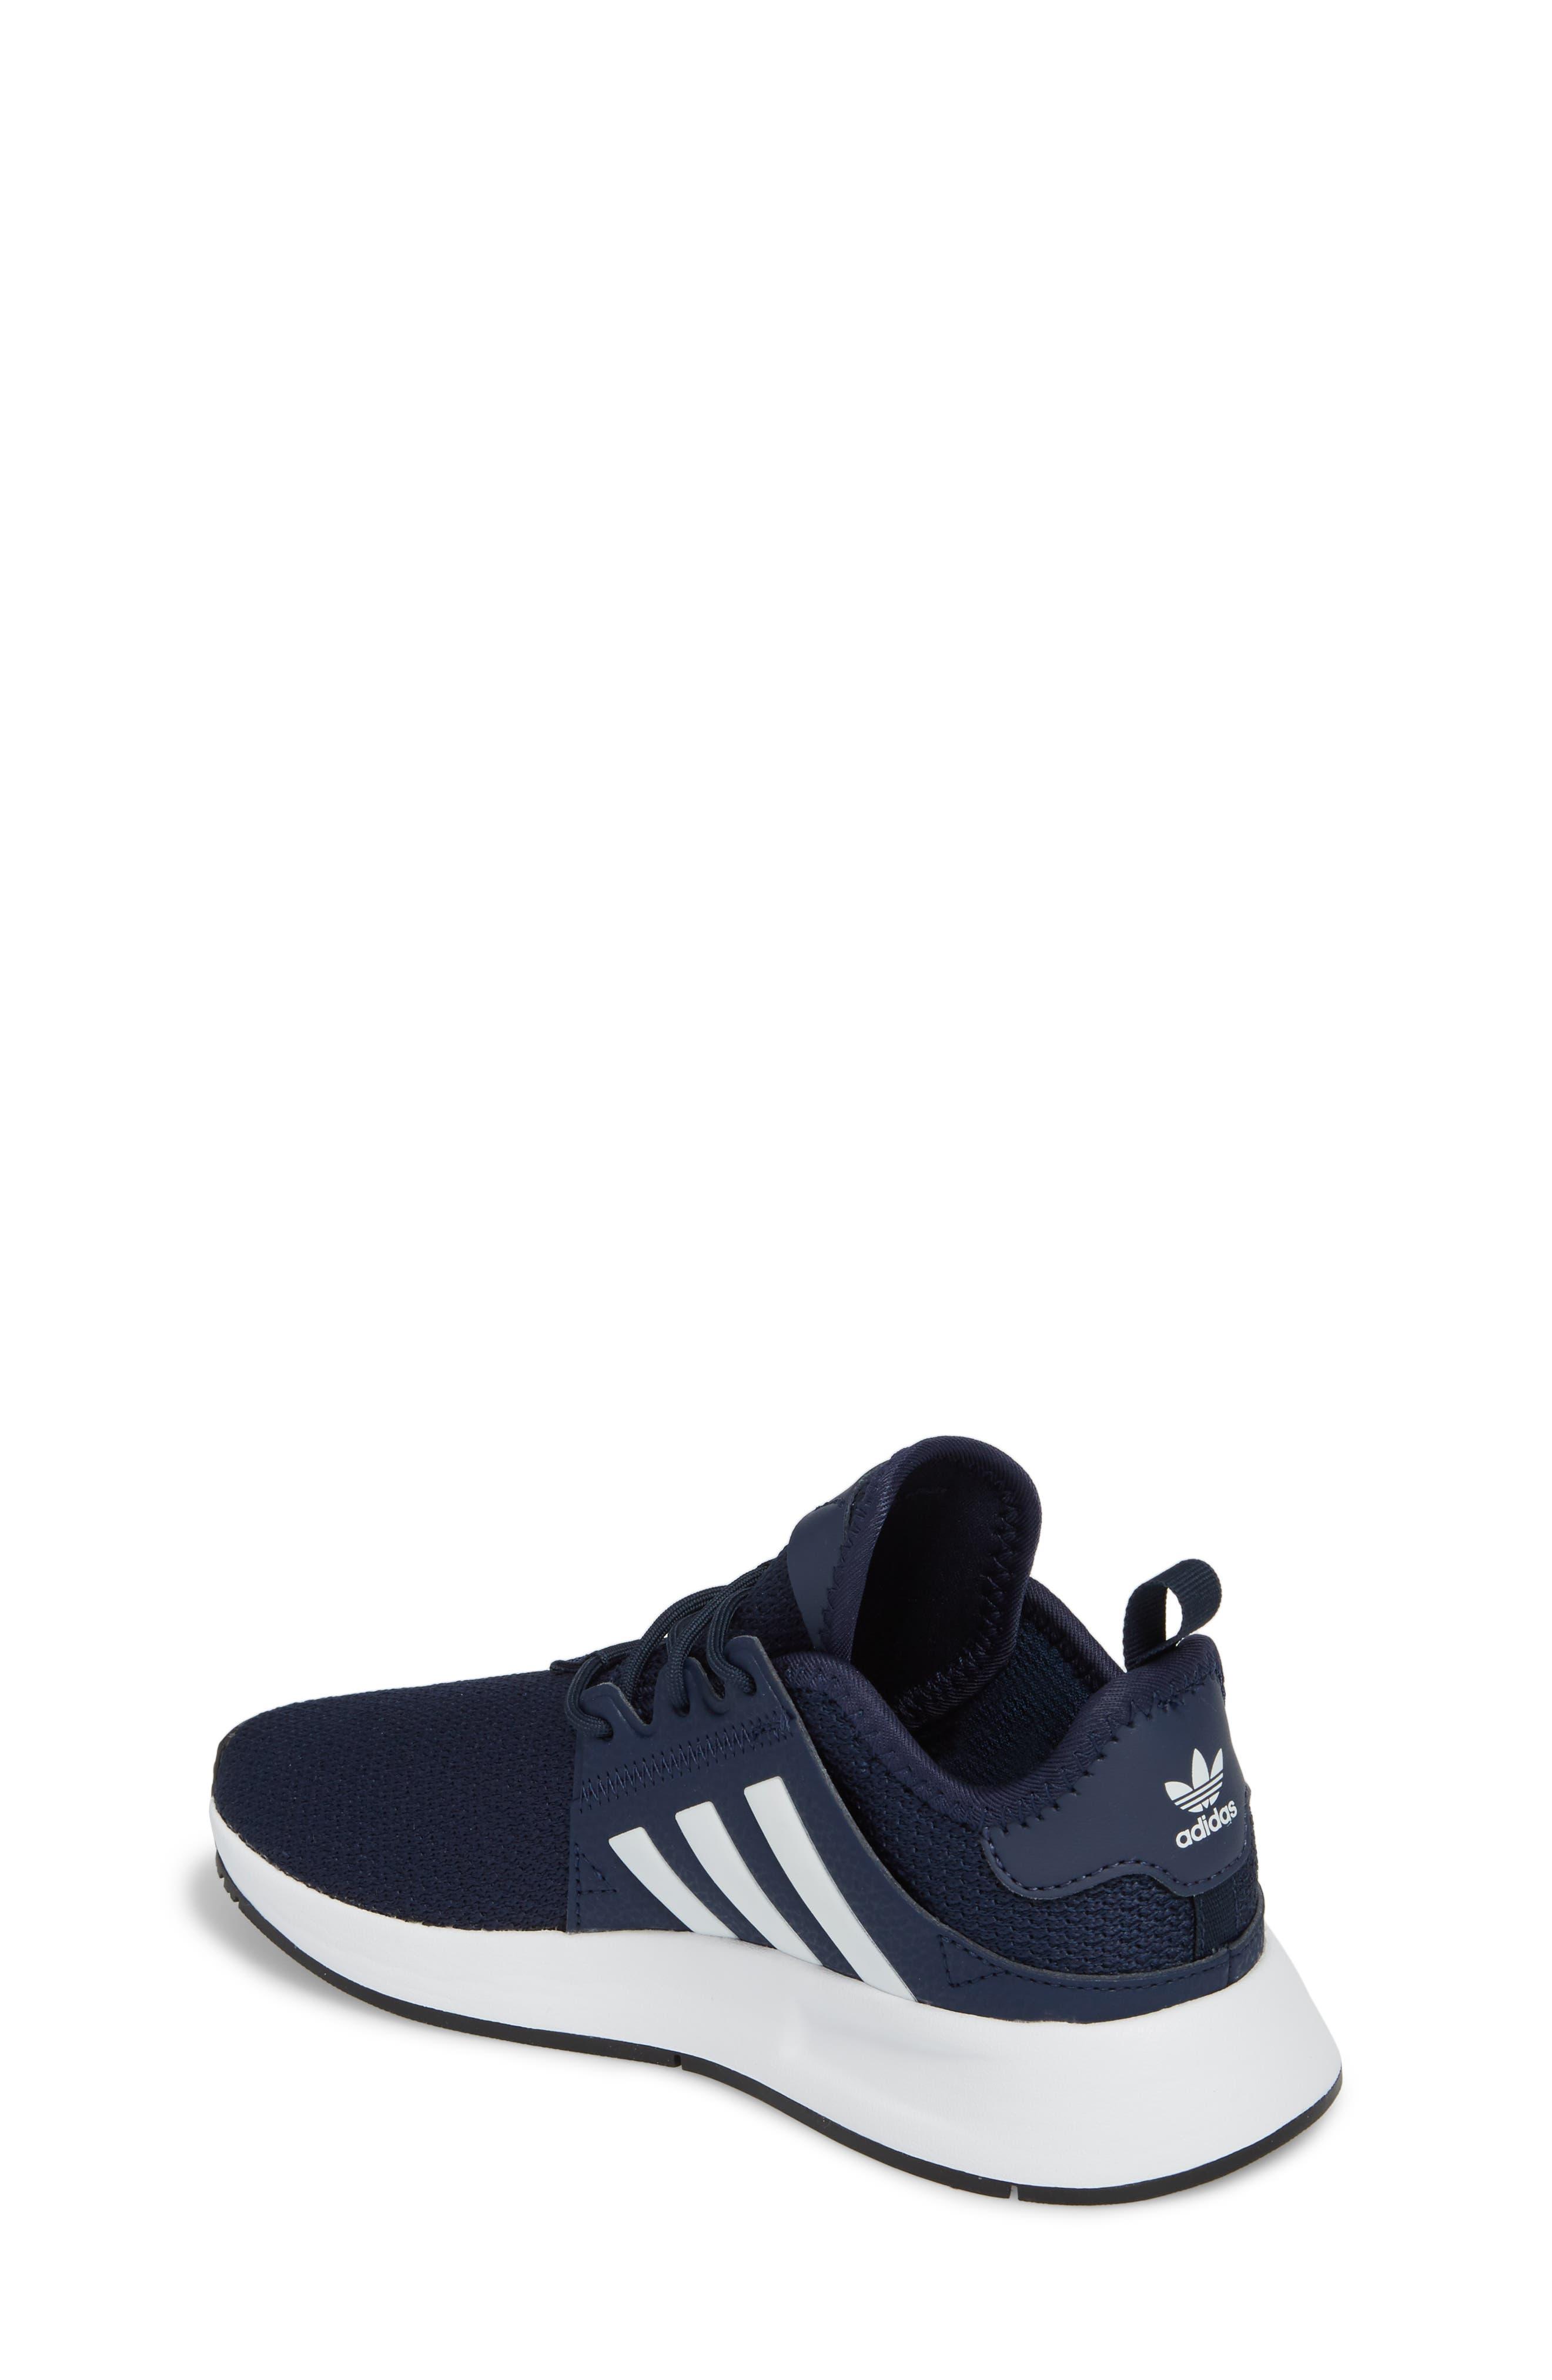 maschile adidas baby & walker scarpe nordstrom